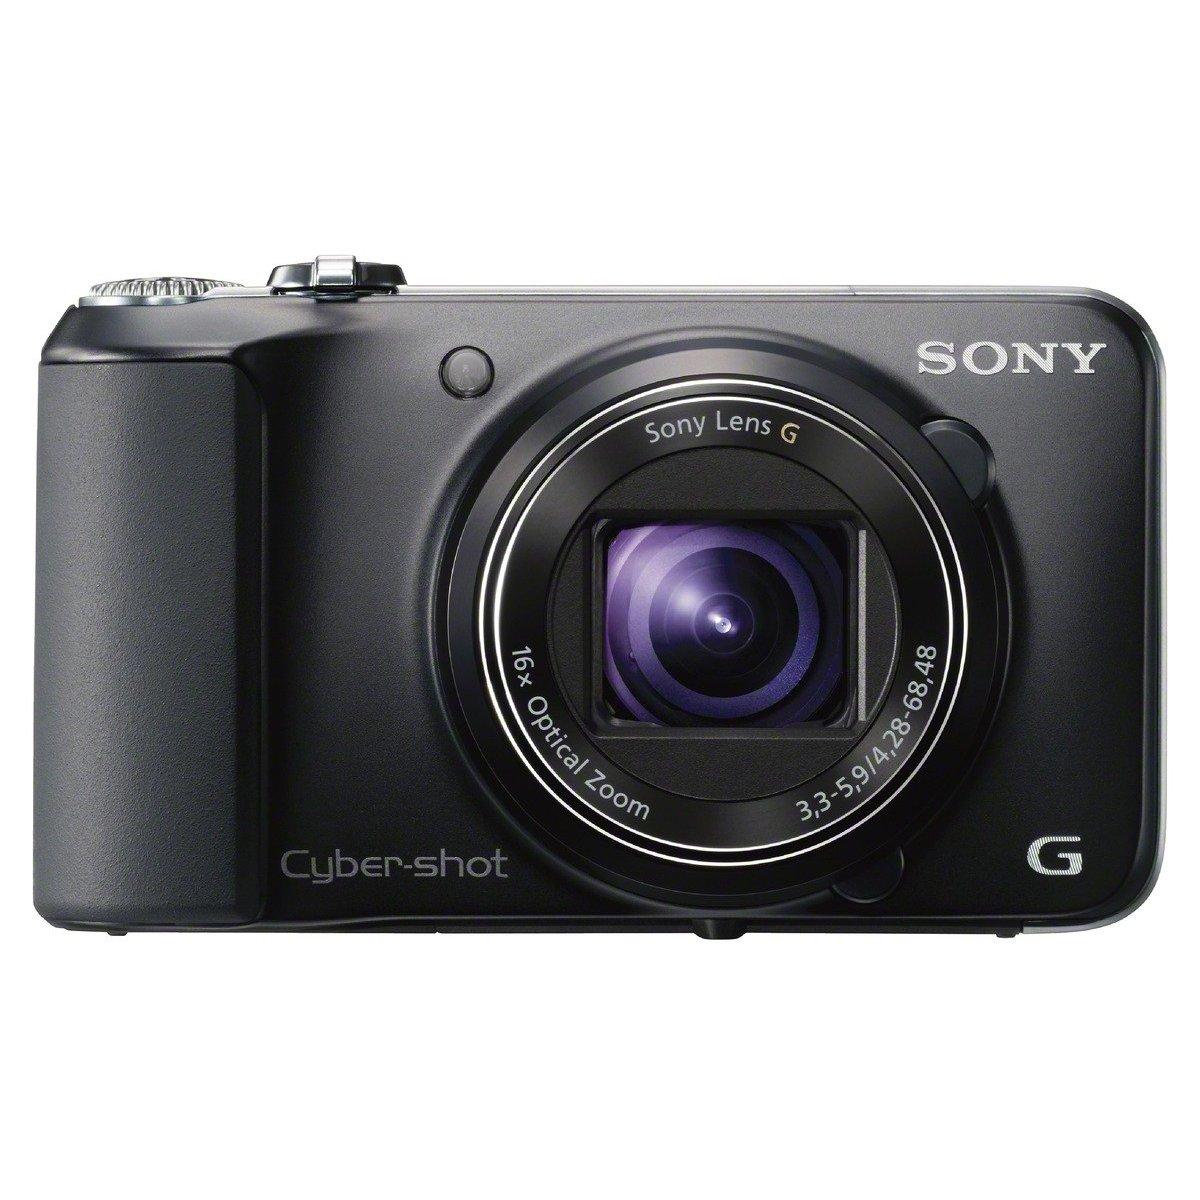 http://thetechjournal.com/wp-content/uploads/images/1203/1331734779-sony-cybershot-dschx10v-182-mp-exmor-r-cmos-digital-camera--10.jpg